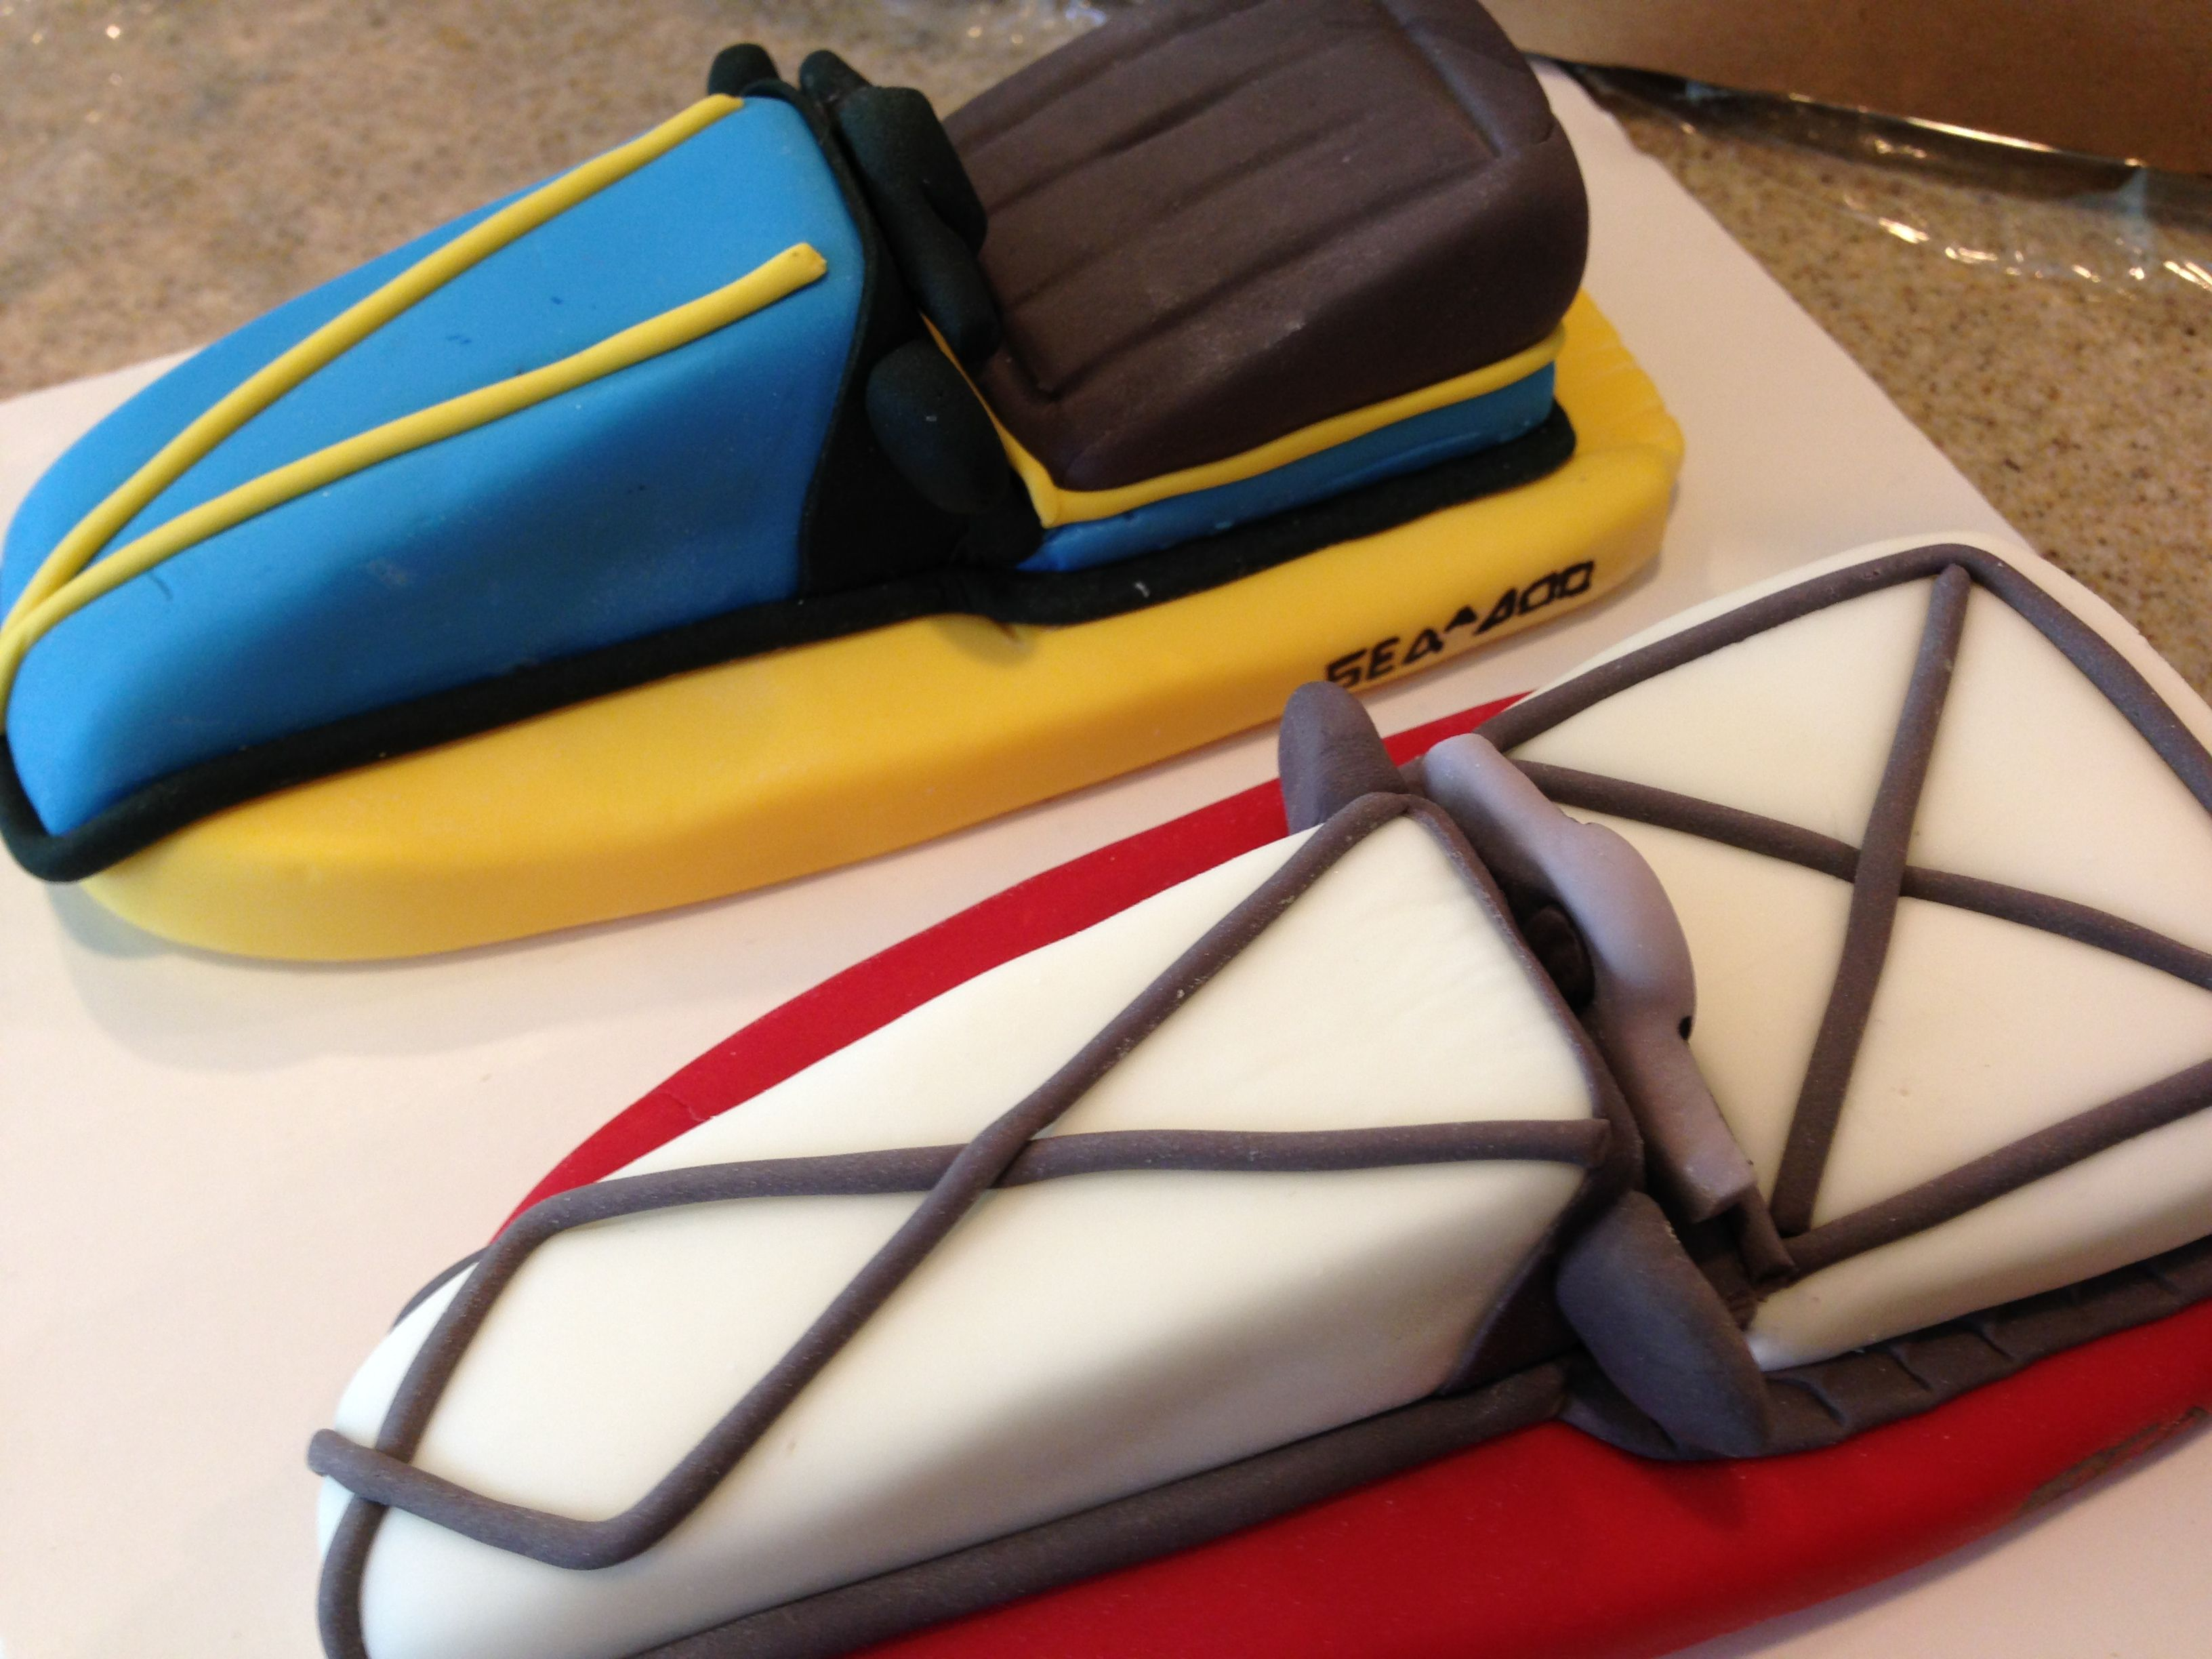 Fondant Jet Ski Sea Doo Cake Toppers Jet Ski Rich Cake Novelty Cakes